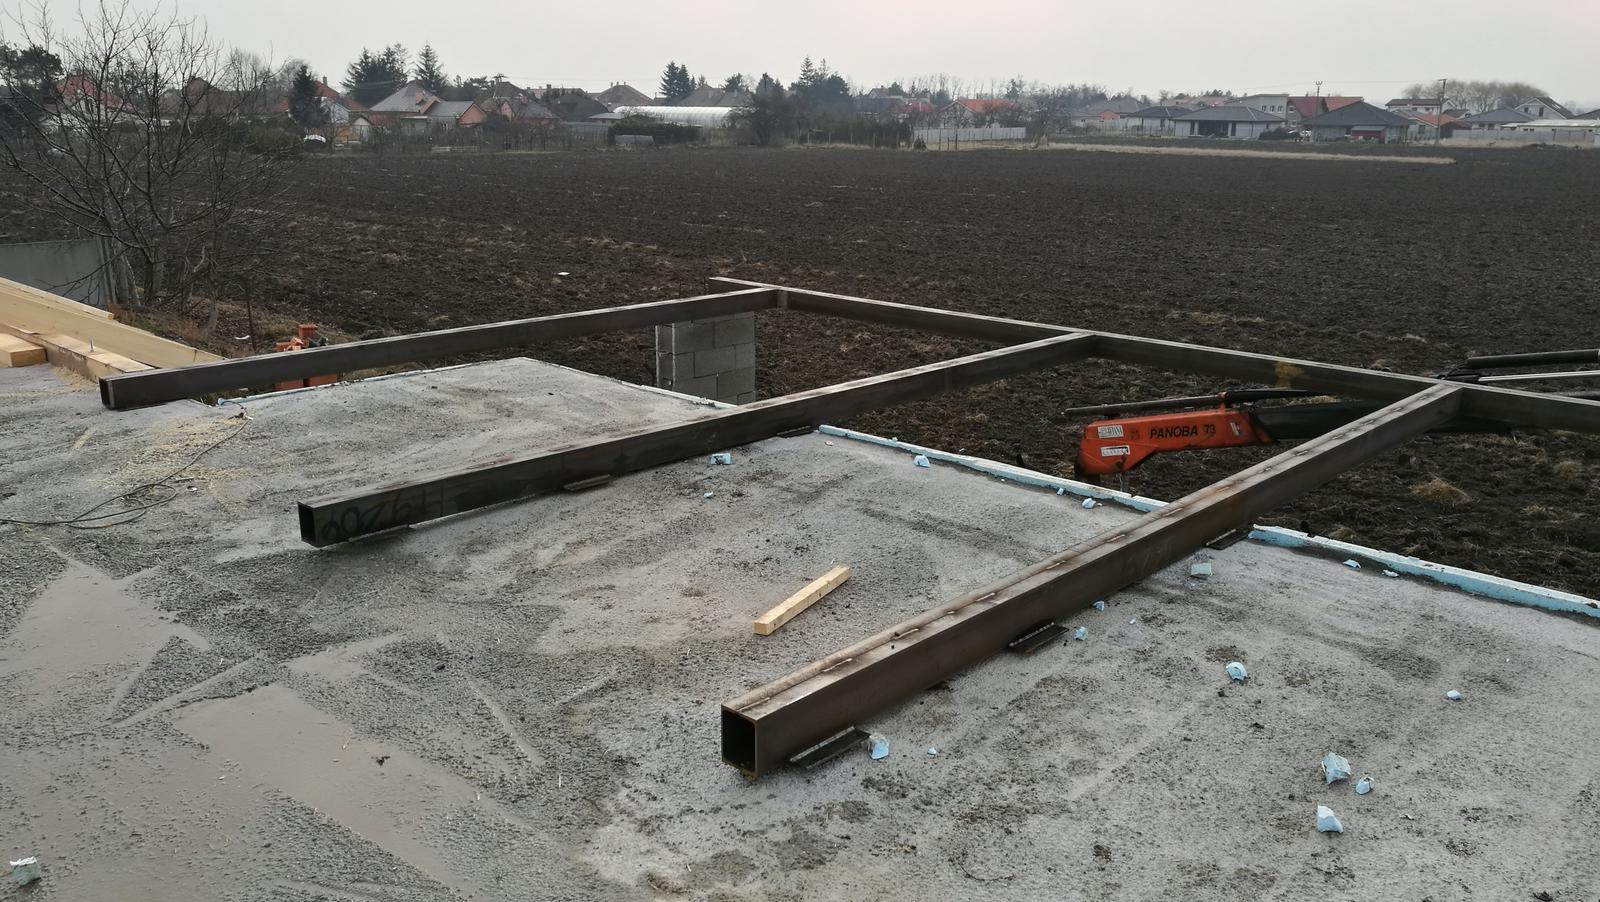 Na pangeroch - 2 zvarene UPN160 ako paky 12 metroveho nosnika nad terasou ukotvene do betonu stropu a na koncoch zatazene stojkami krovu strechy.